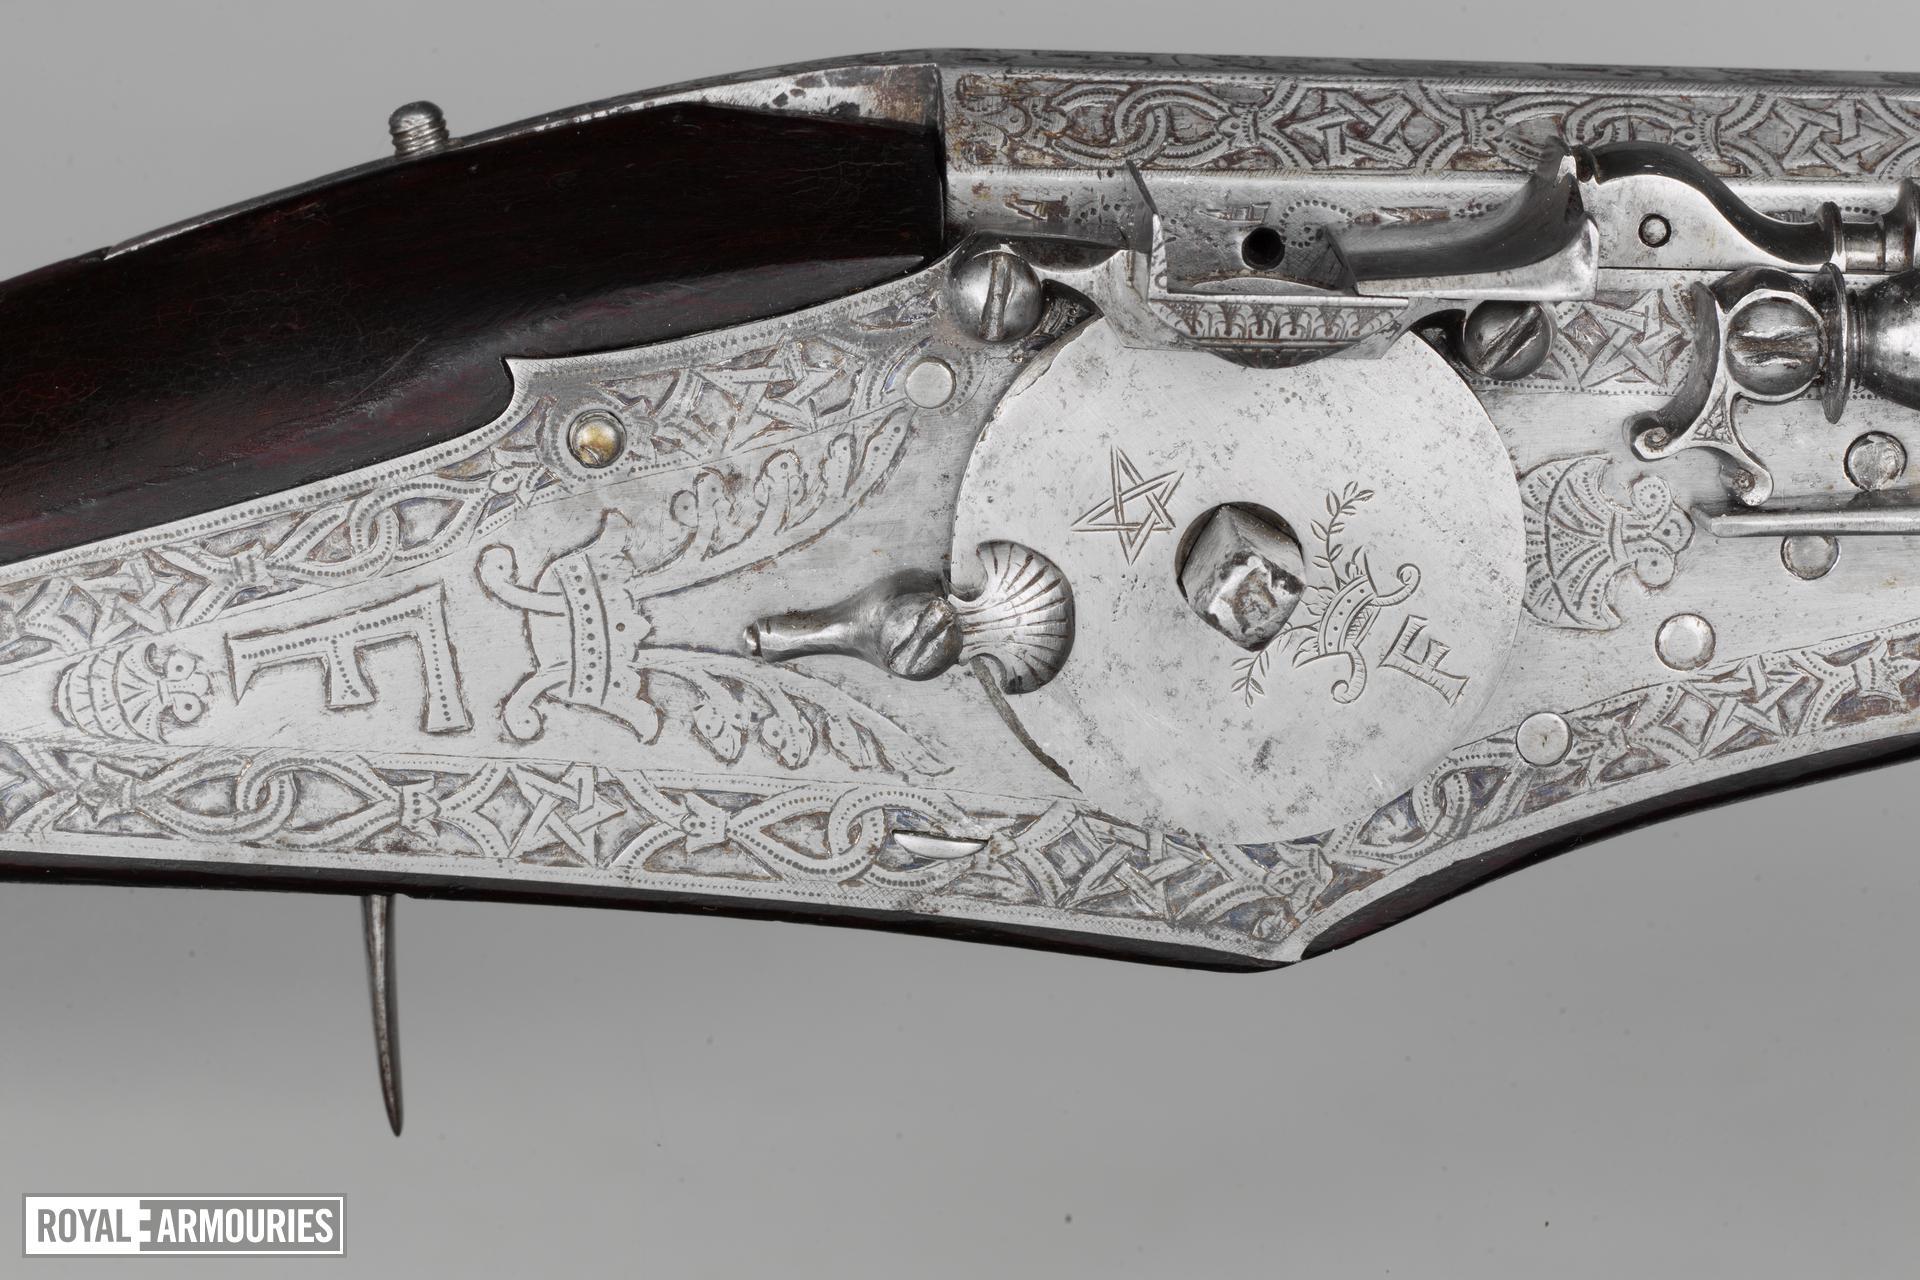 Wheellock holster pistol For Don Diego Felipe de Guzman, Marques de Leganes